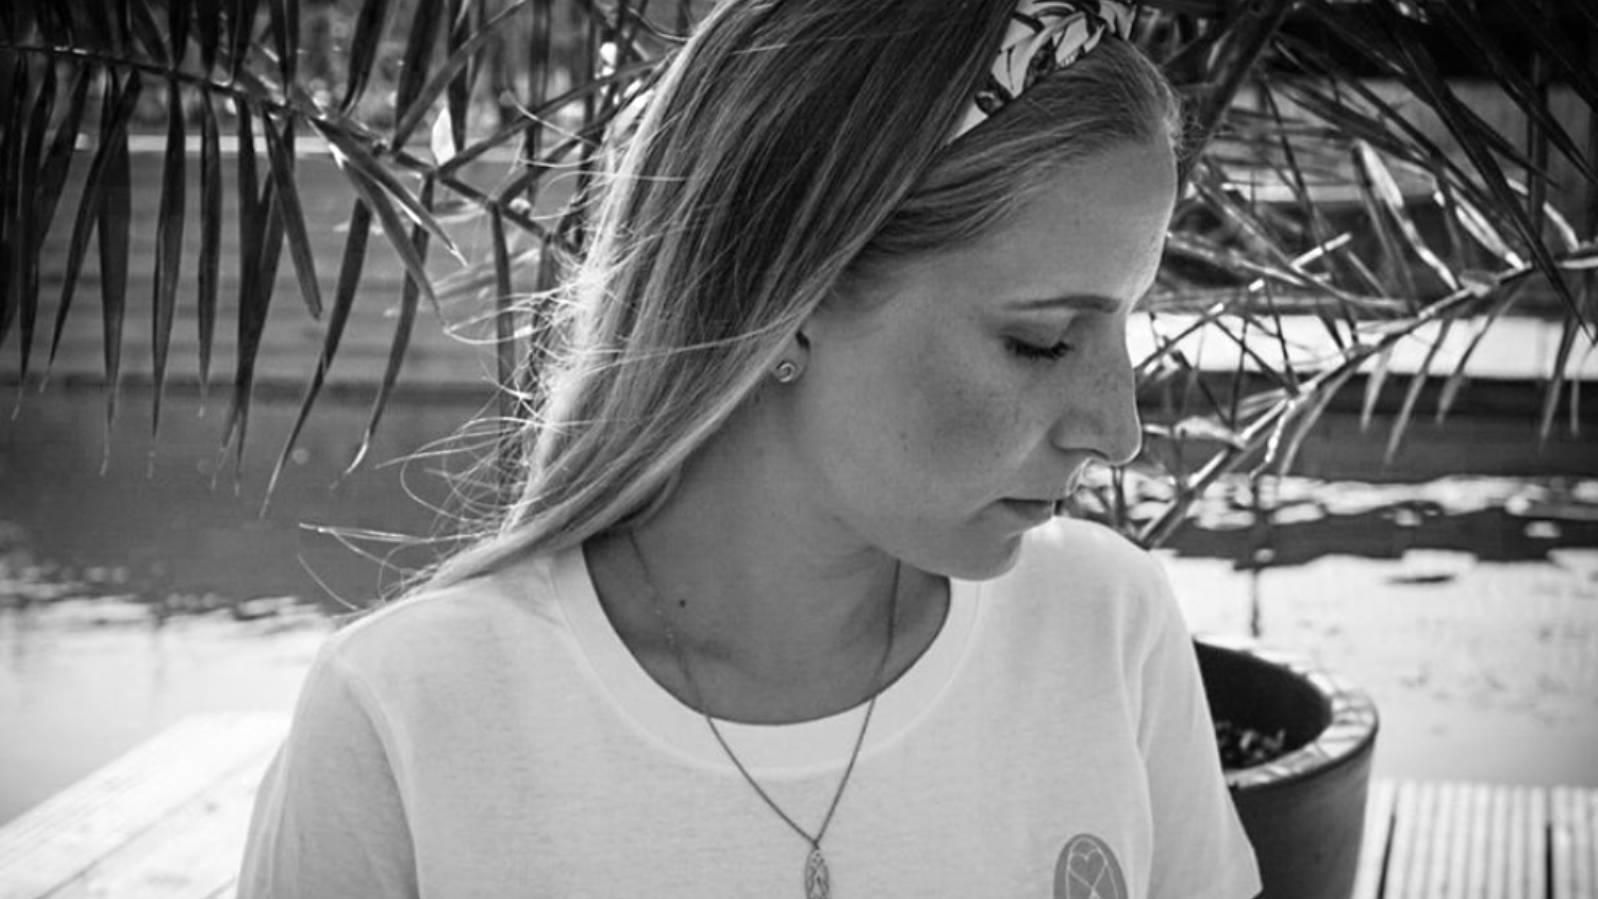 Bloggerin Tamara, alias knallxbunt ist offenbar gestorben